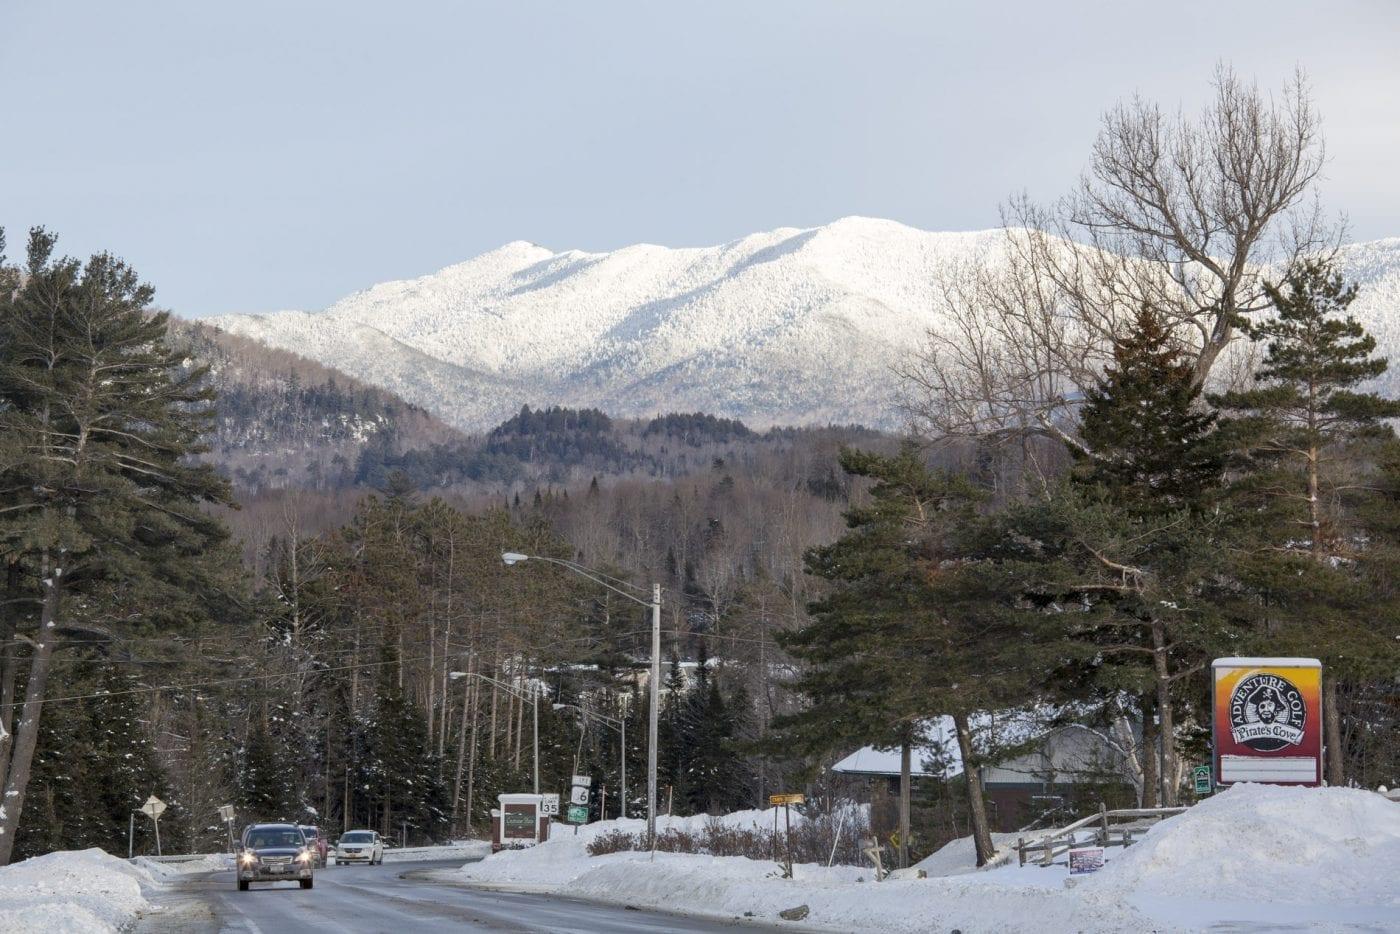 Snowy-Peaks-Adirondacks-Mike-Lynch-20